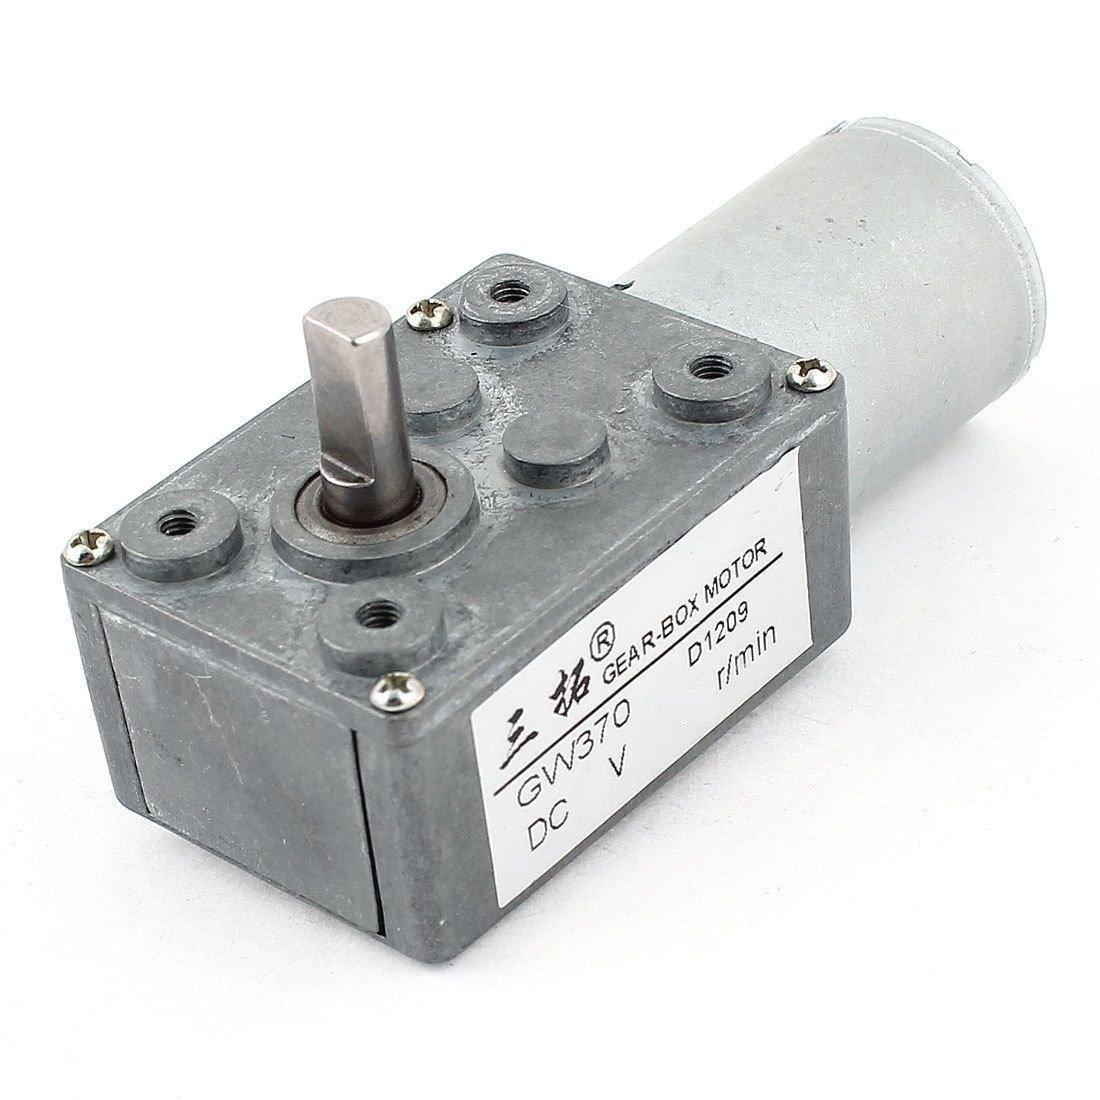 12V 0.15A 2RPM 15kg.cm Low Speed High-torque Reducer Gearbox DC Worm Gear Motor